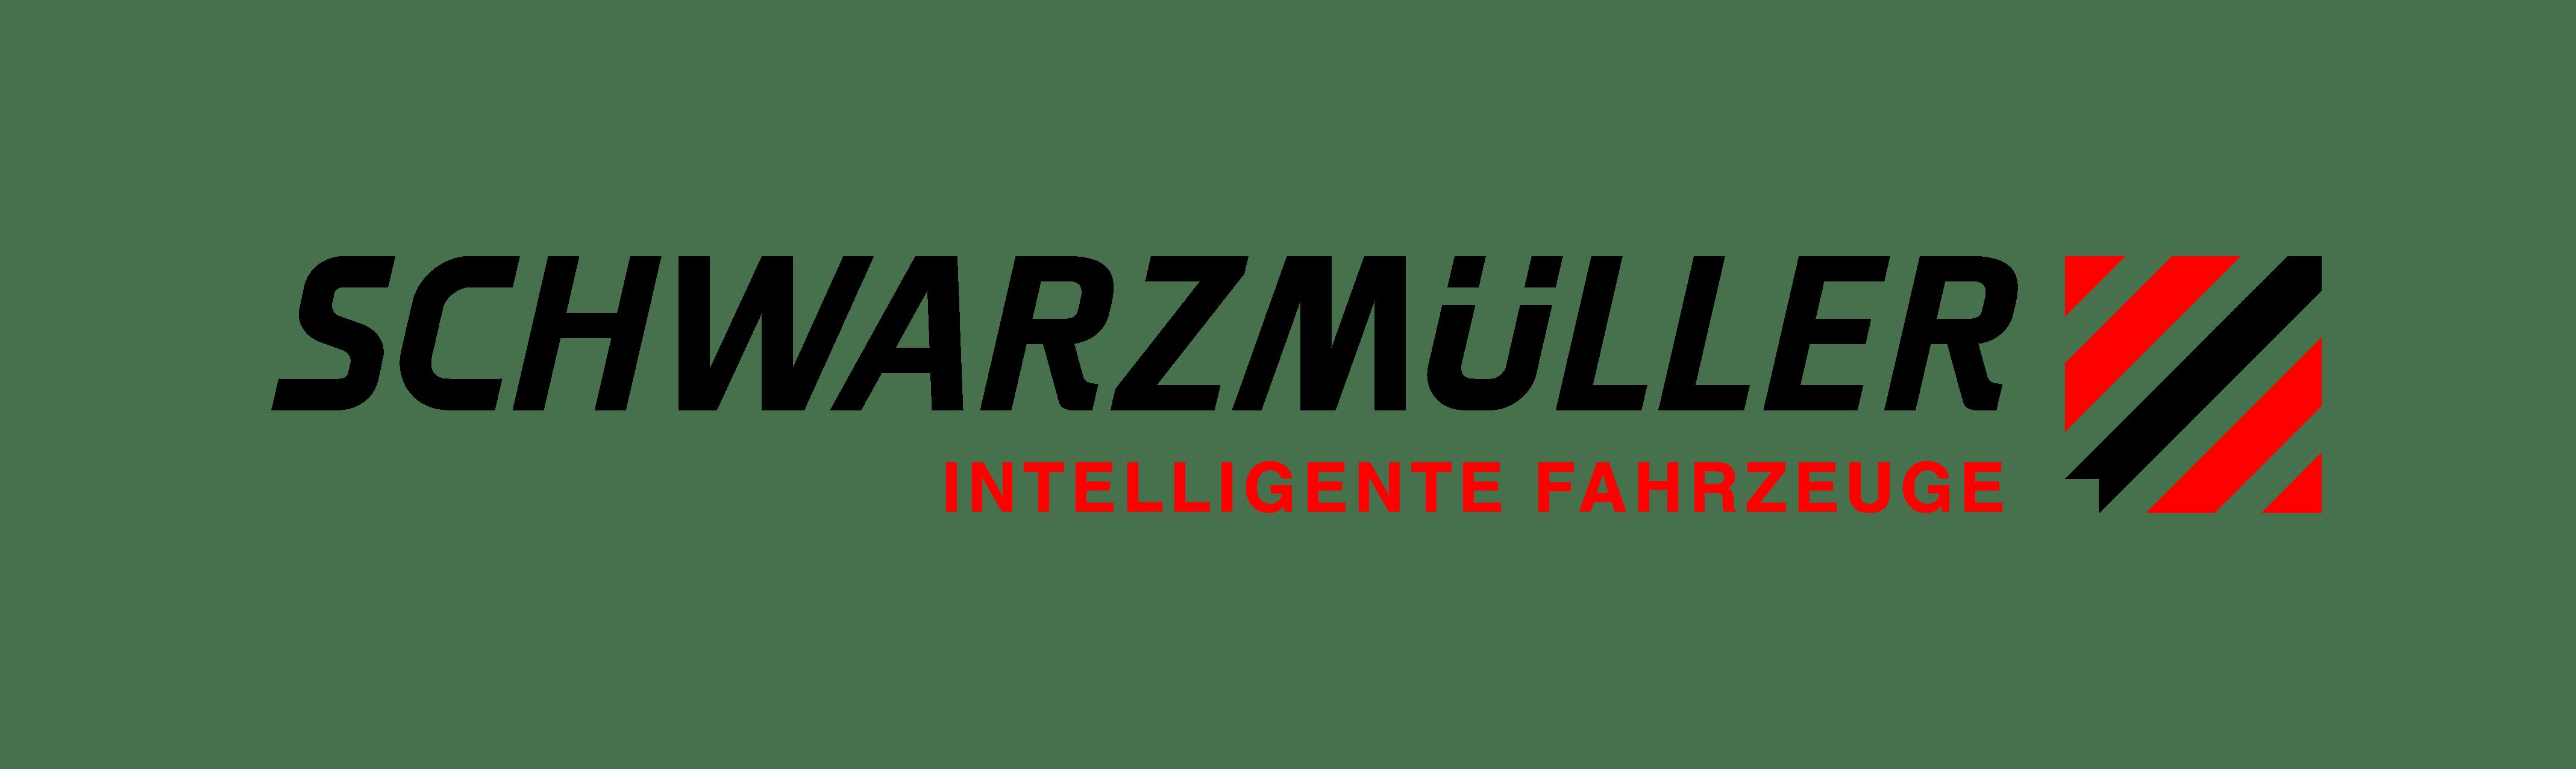 Schwarzmüller Logo KeyShot CGI